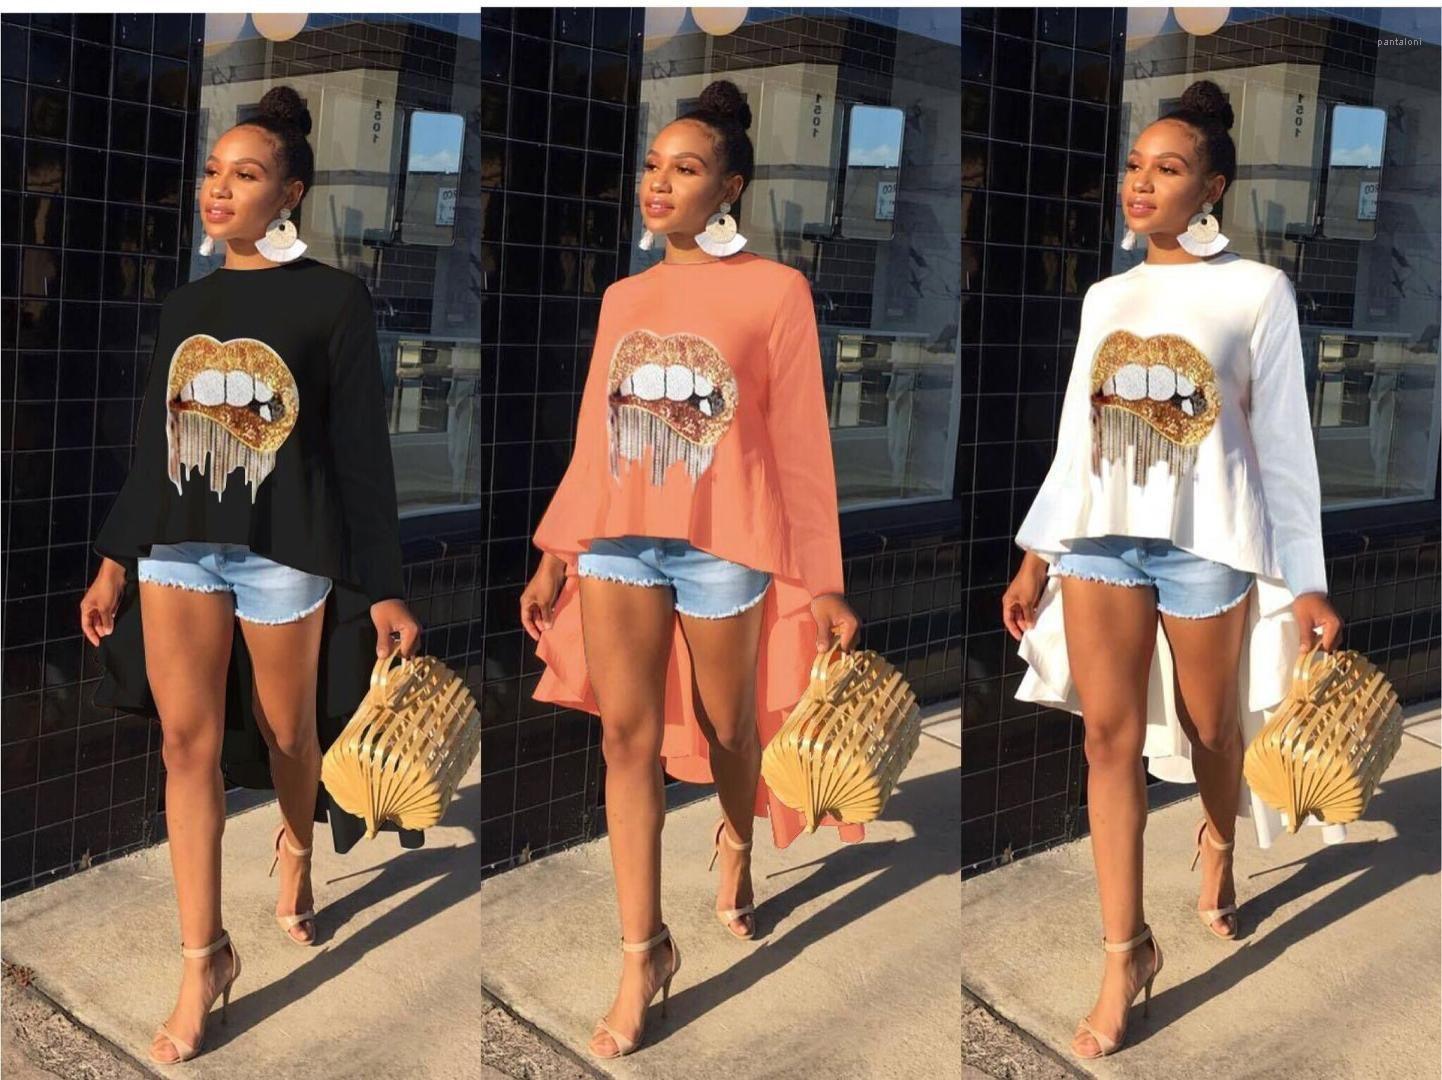 Diamond Lips Womens Tshirt Summer Womens Designer T Shirts Fashion Casual Ladies Designer Luxury Clothes Sequins Online T Shirts Buy In T Shirts From Pantaloni 17 88 Dhgate Com